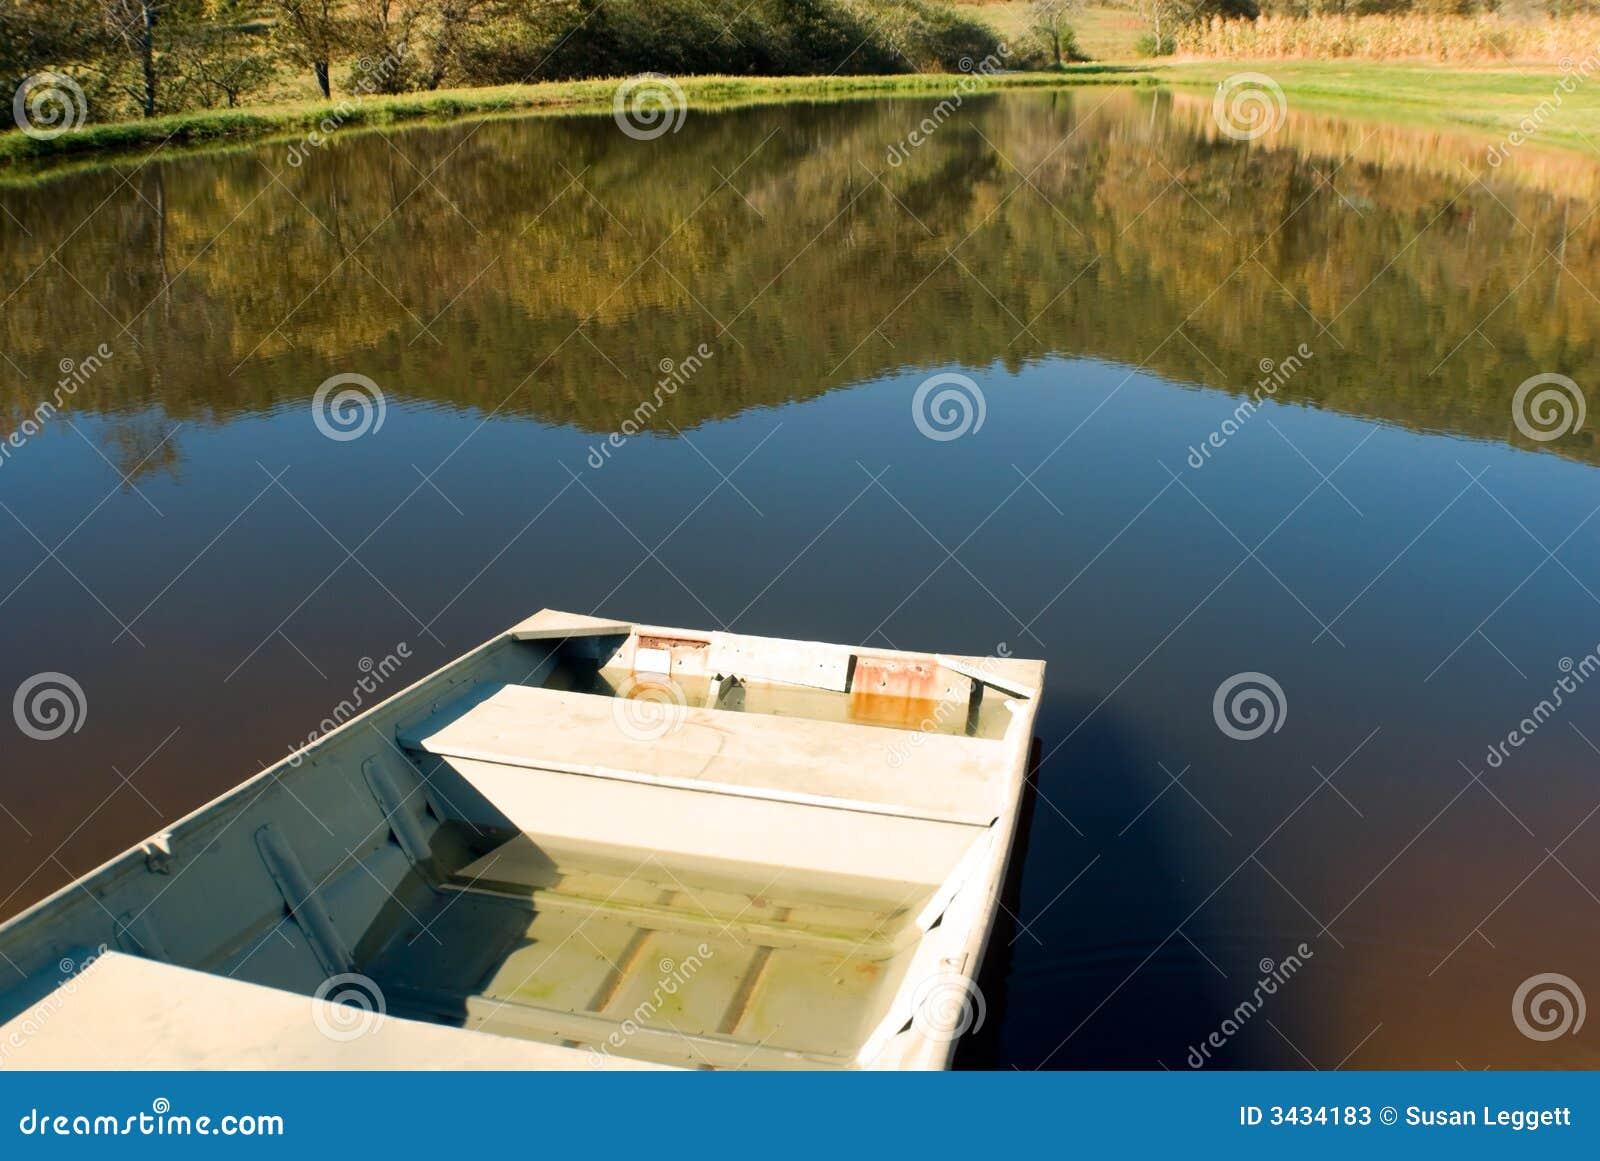 Boat at small pond